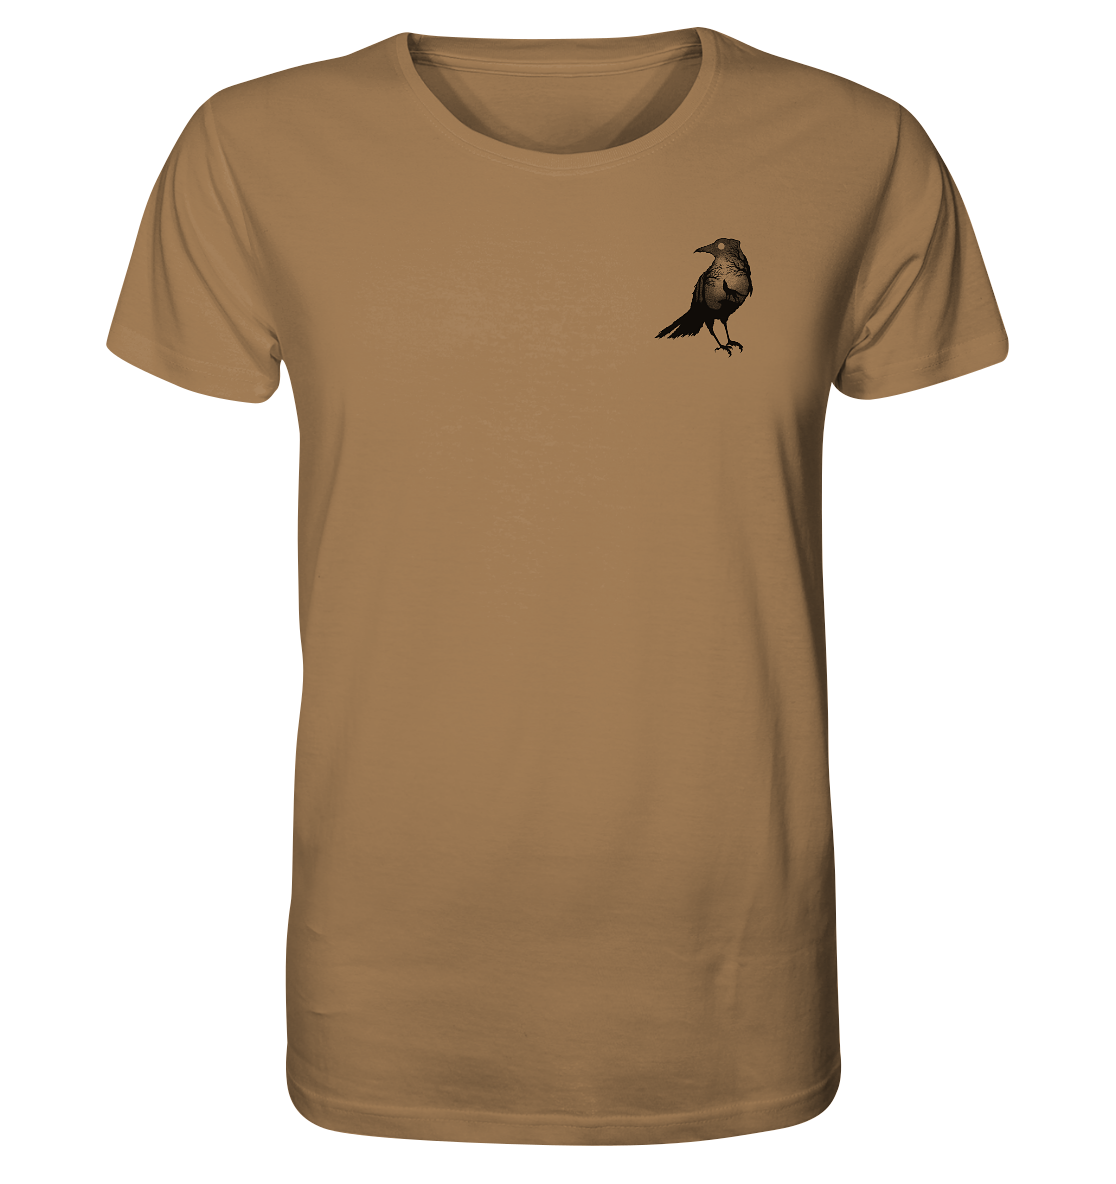 front-organic-shirt-a17c55-1116x-3.png